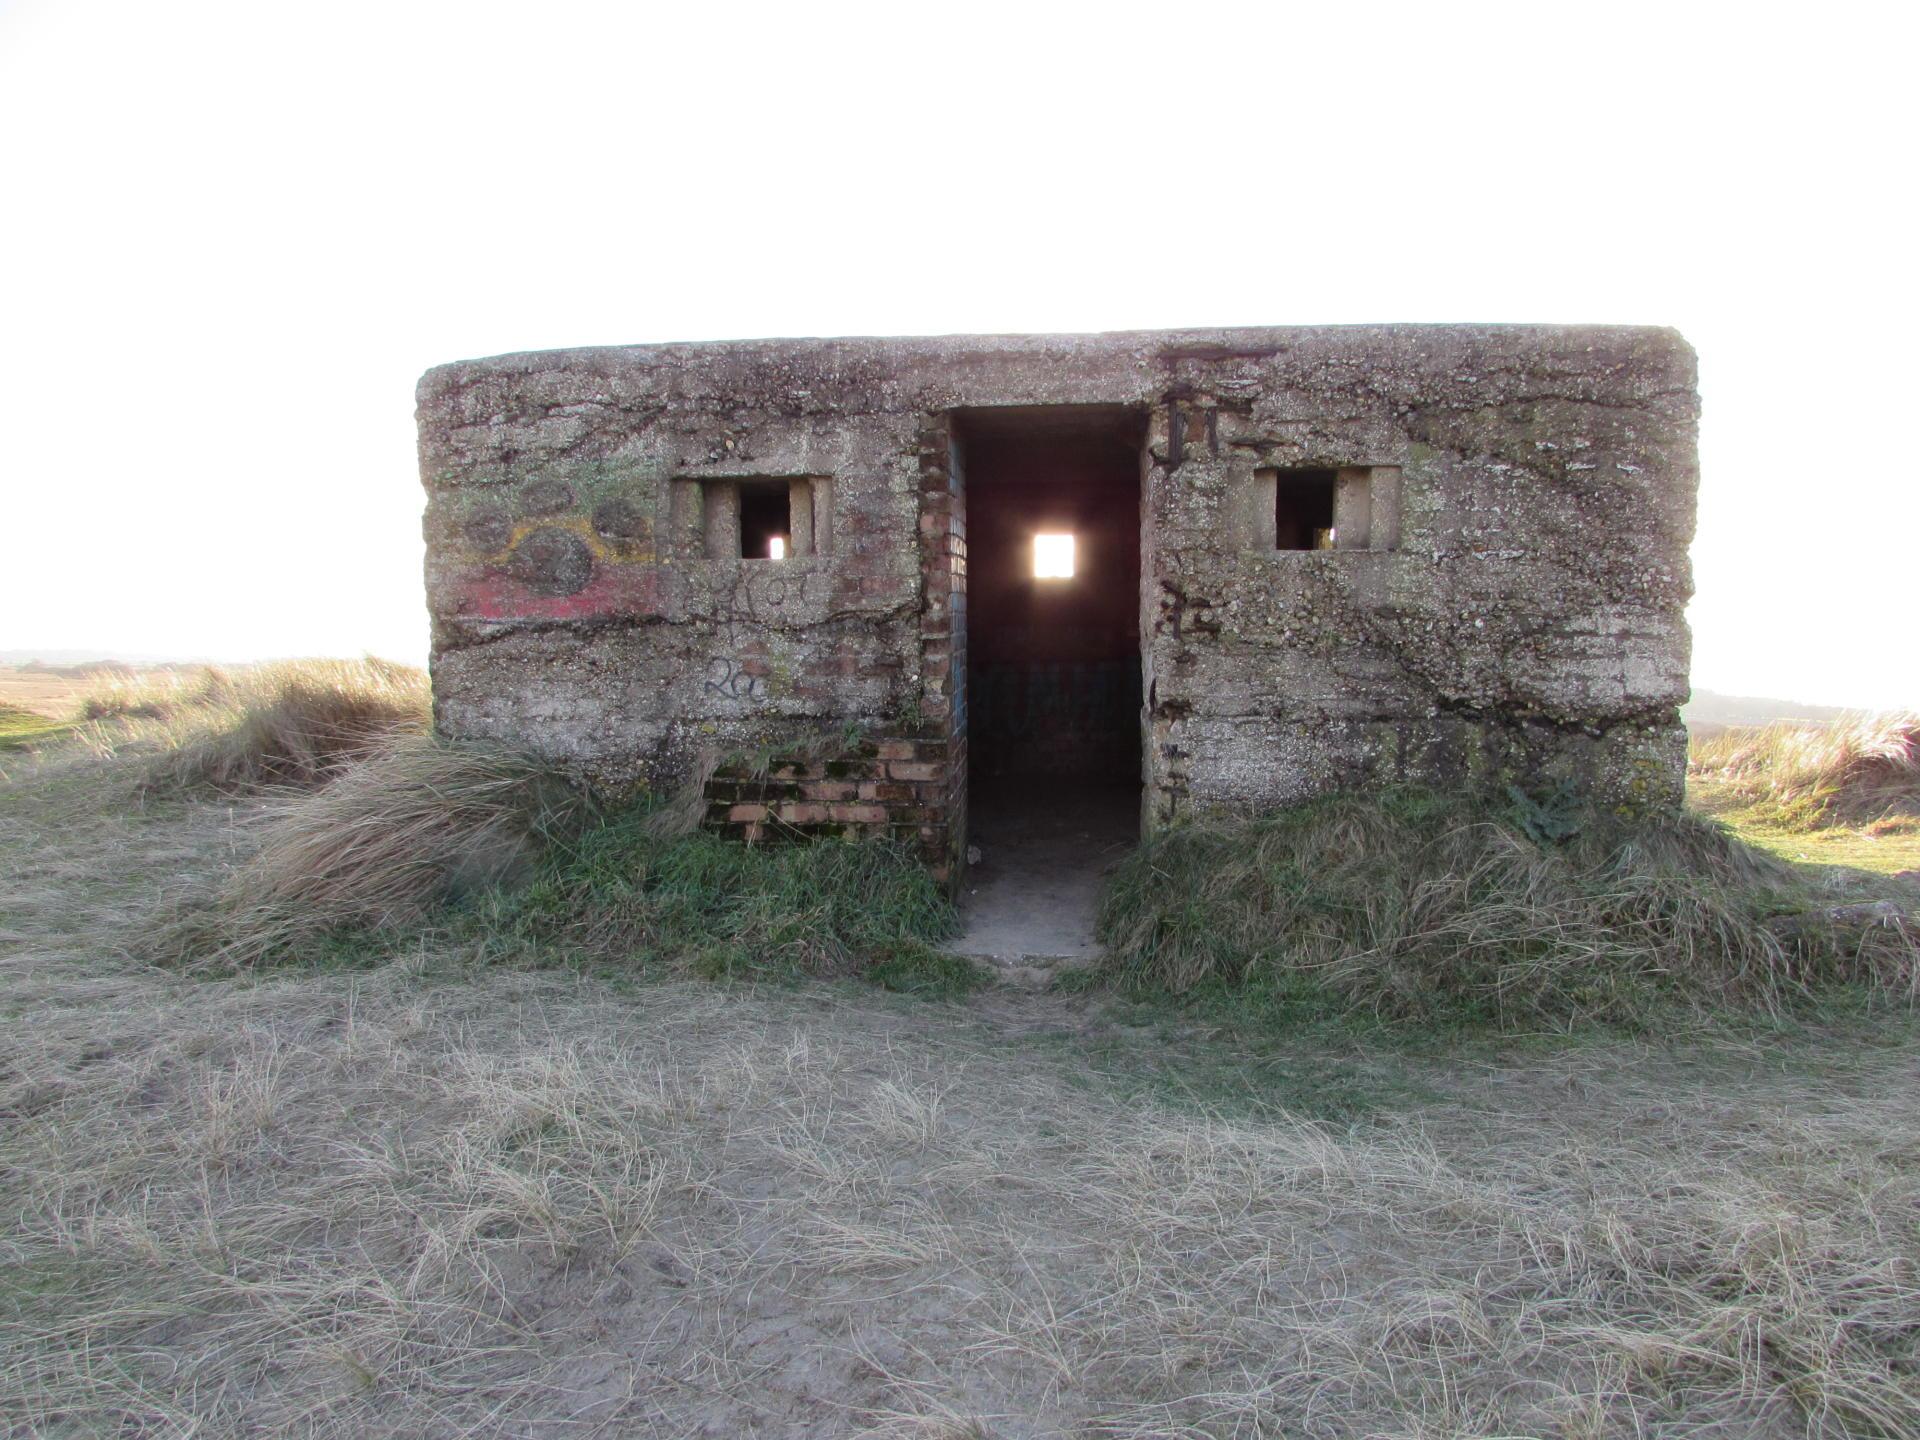 Seal Watching in North Norfolk - Yesihaveablog | WW2 Pillbox Horsey Gap | Norfolk - Life in a Fine City | Winterlust